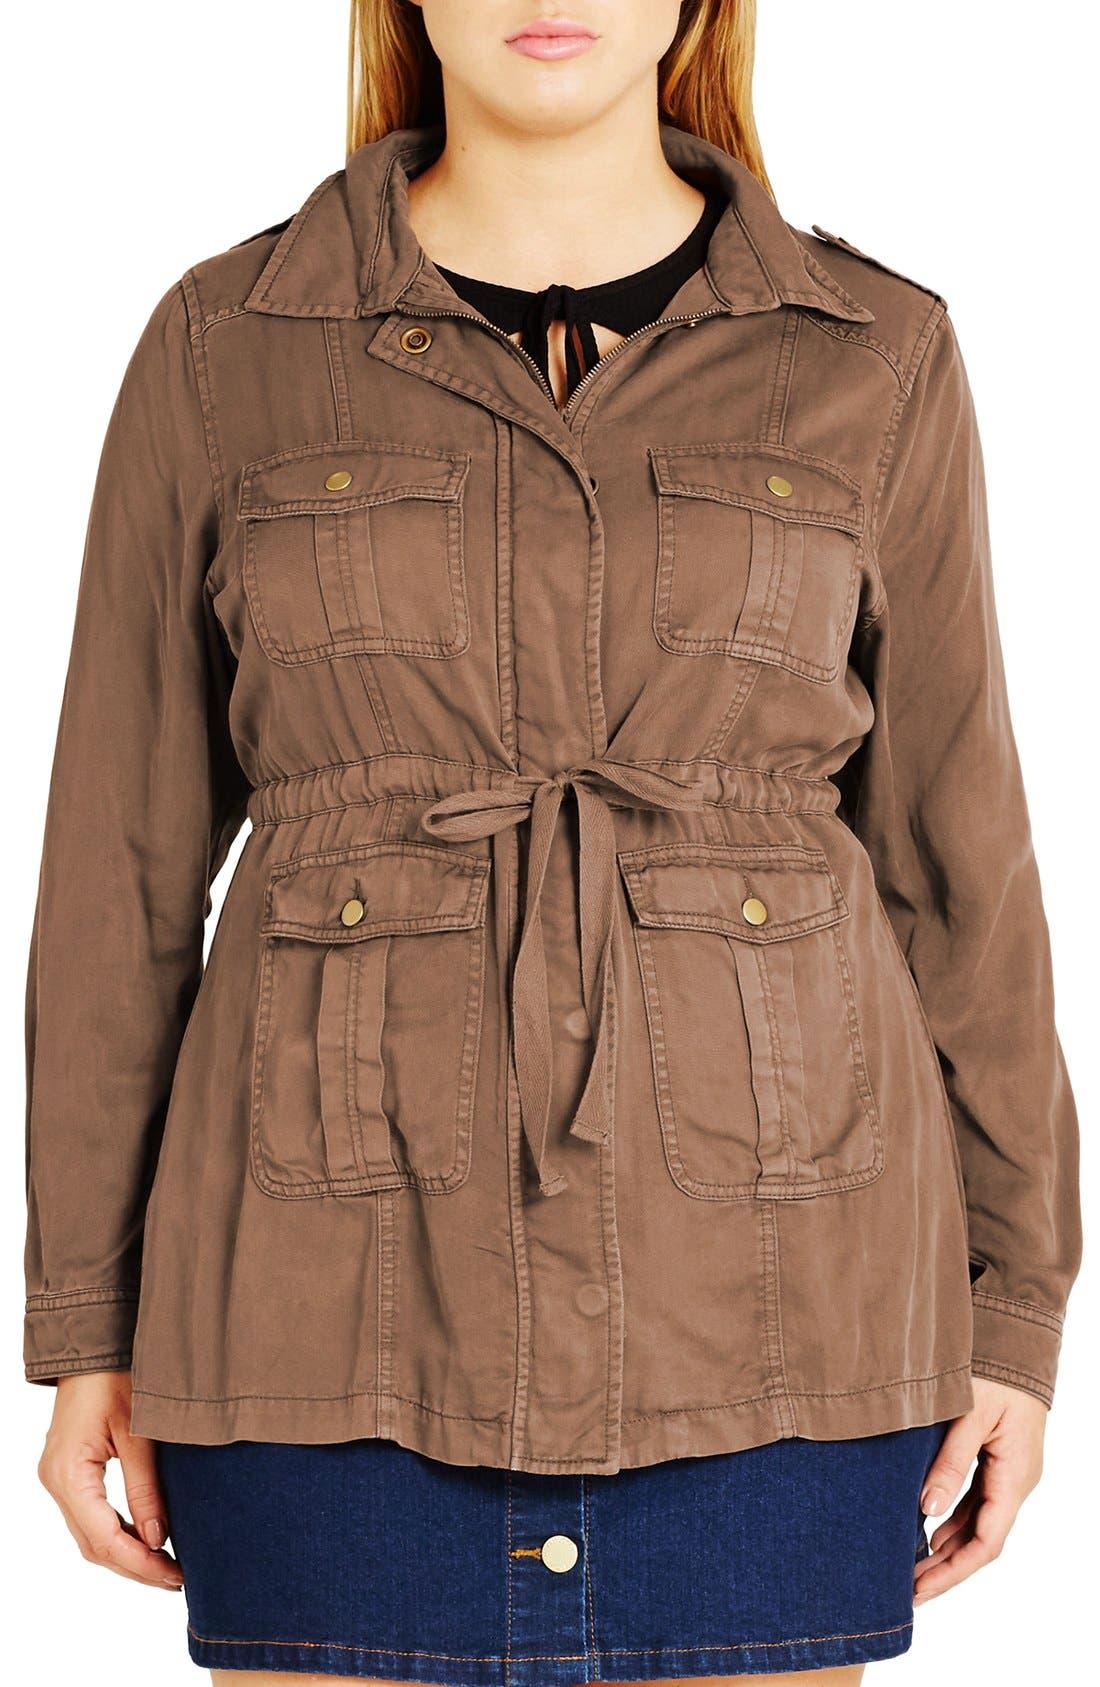 Main Image - City Chic 'Adventure' Utility Jacket (Plus Size)